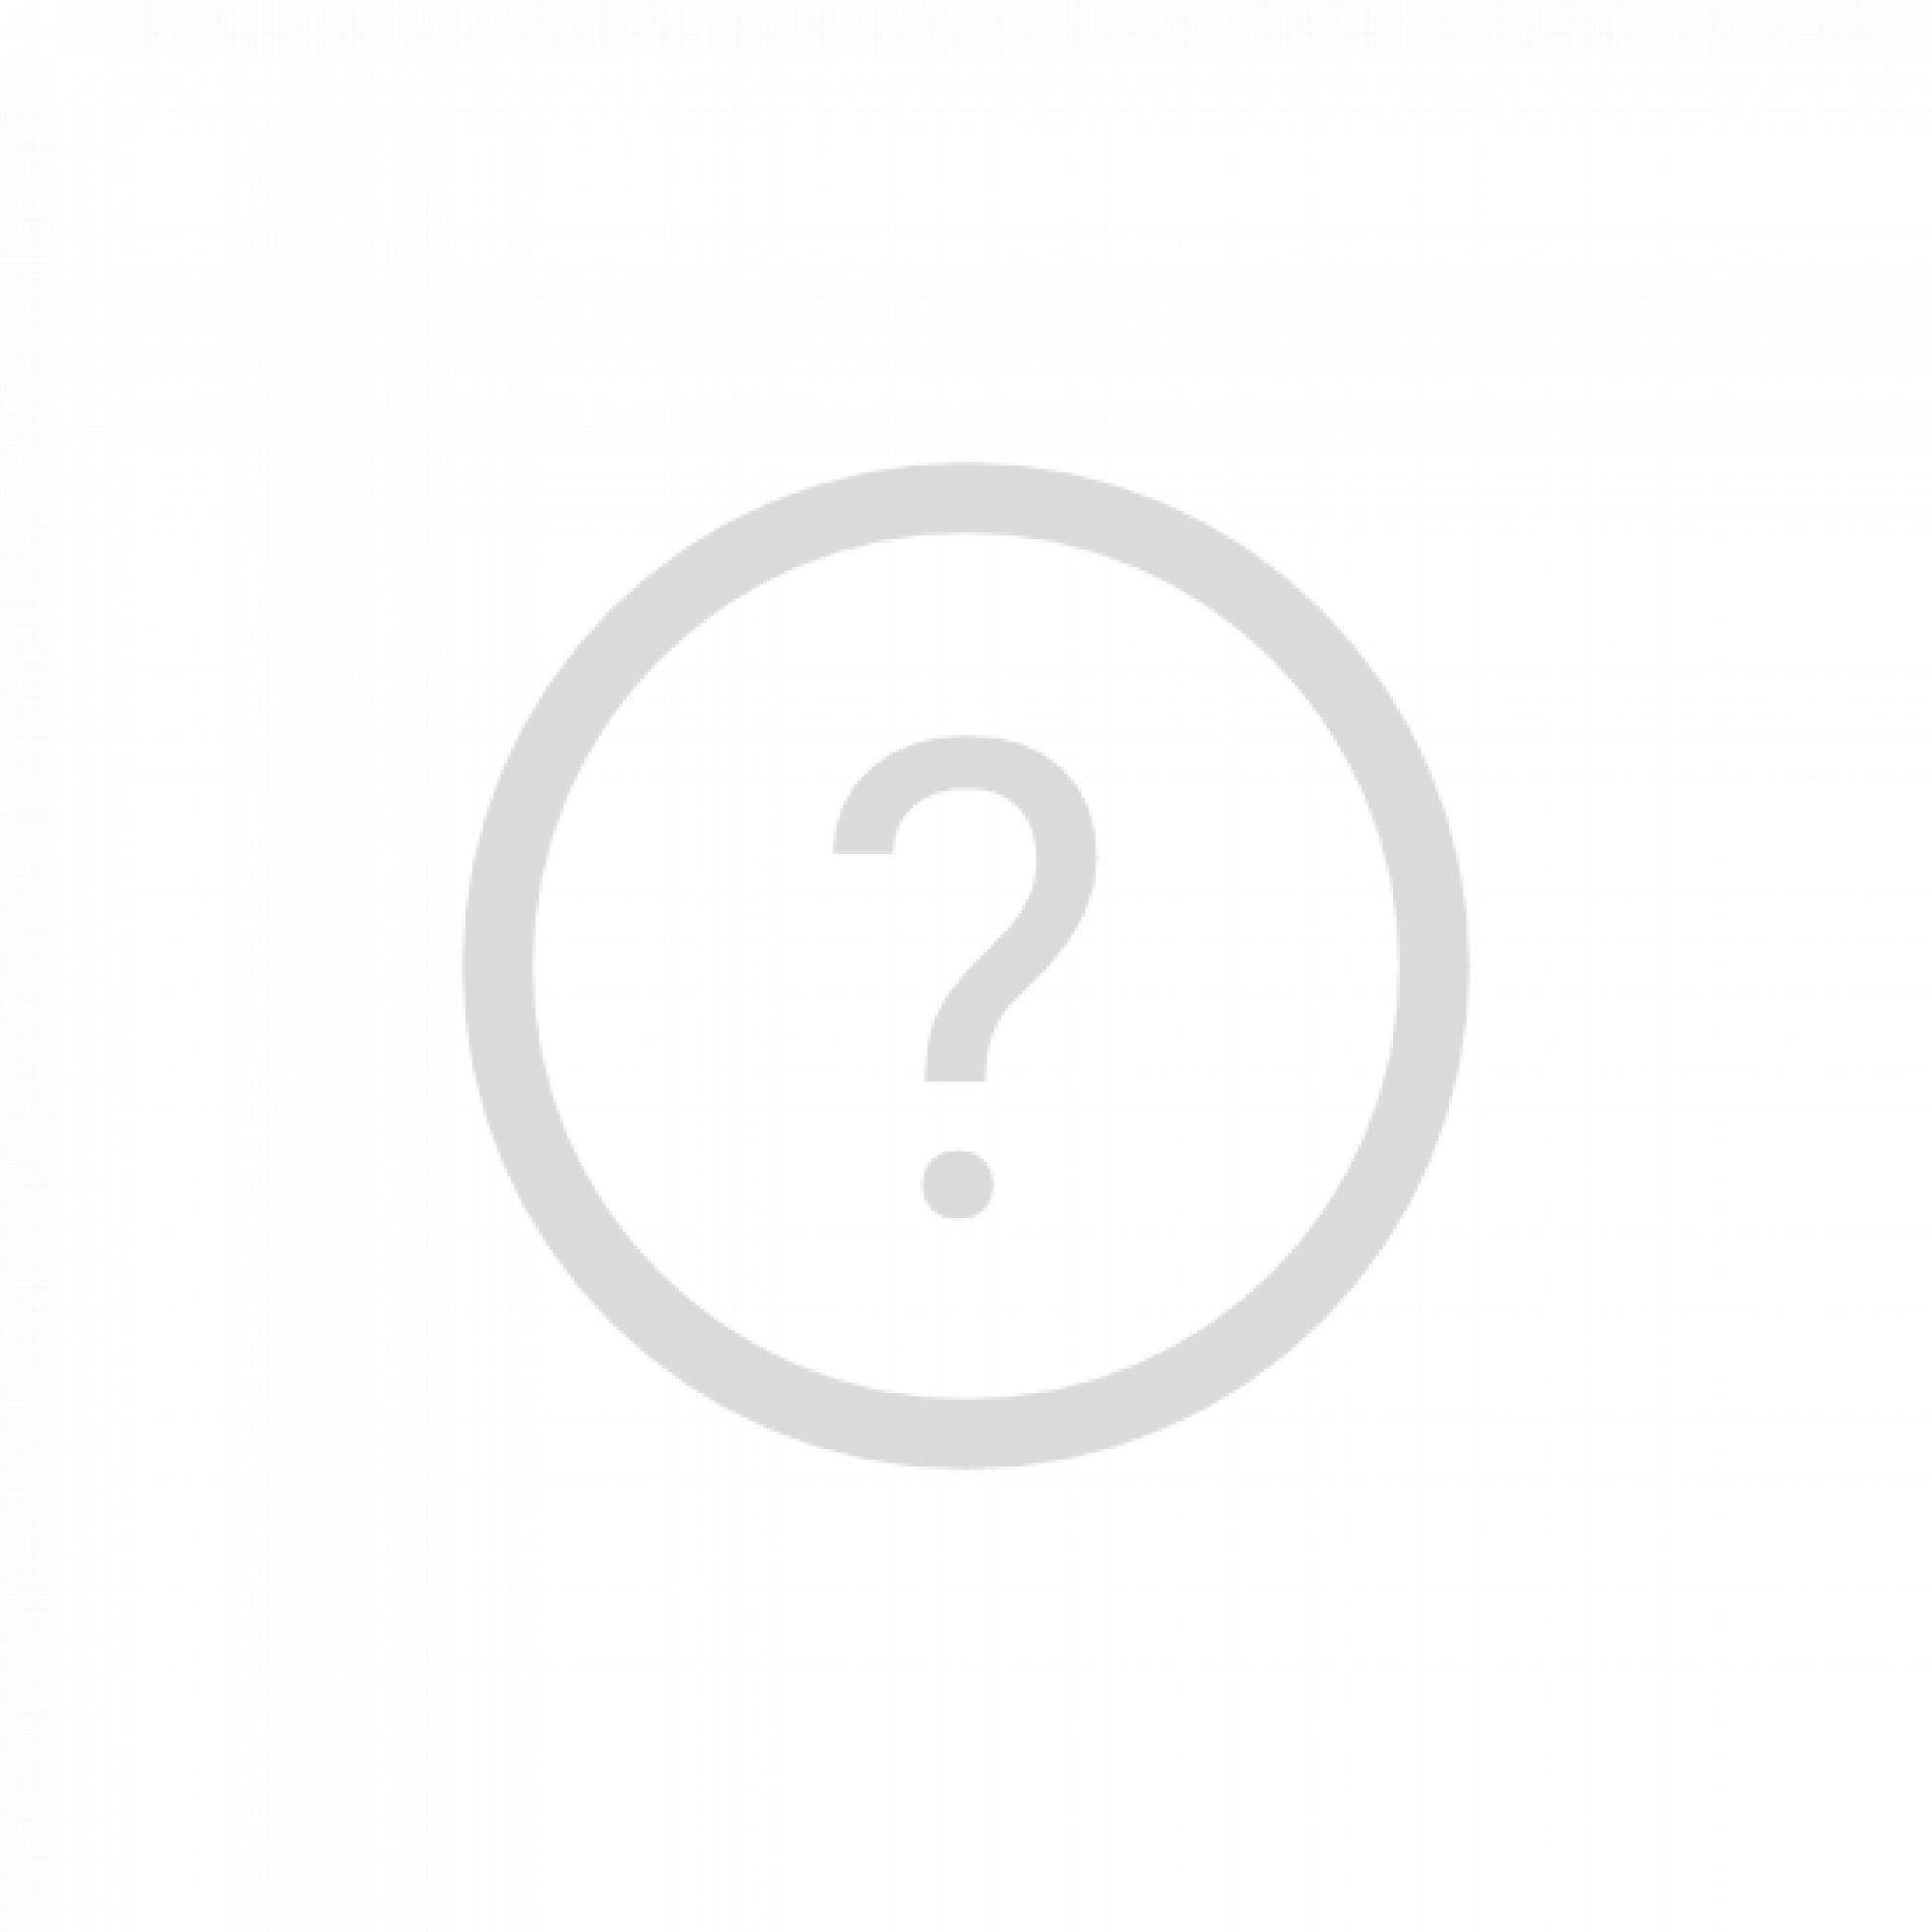 ATS Cup Felgen diamant-schwarz Frontpoliert (silber